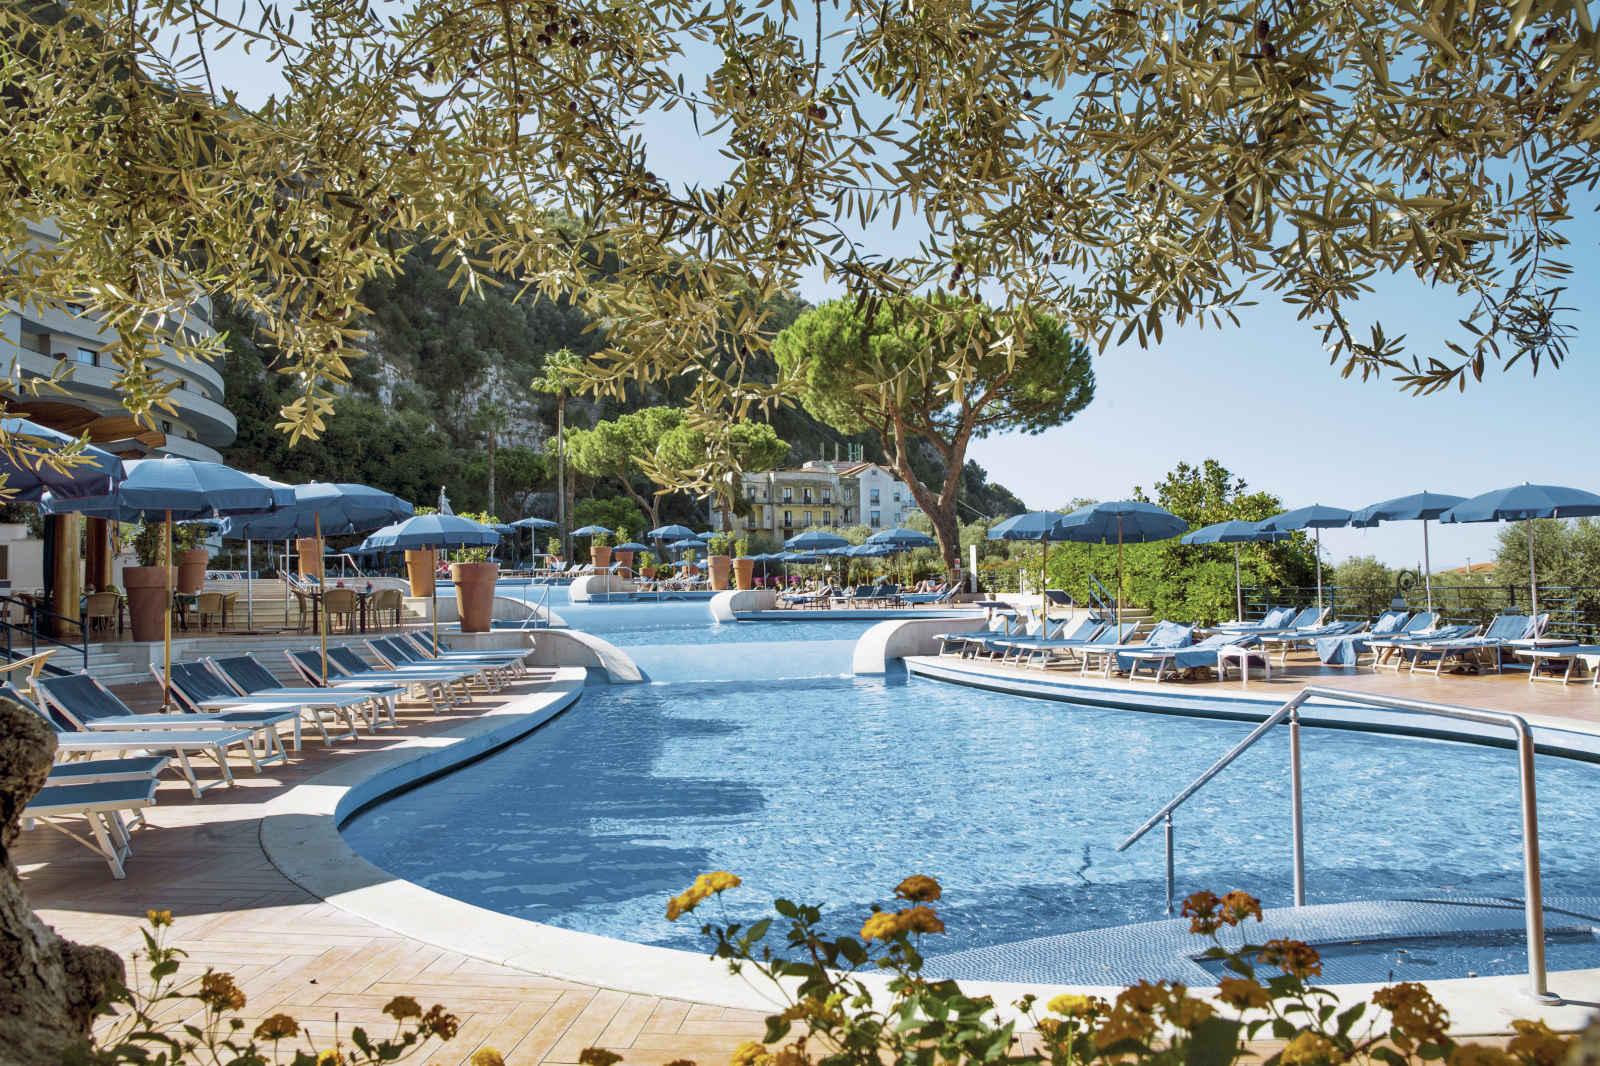 Séjour Côte Amalfitaine - Hilton Sorrento Palace - 4*